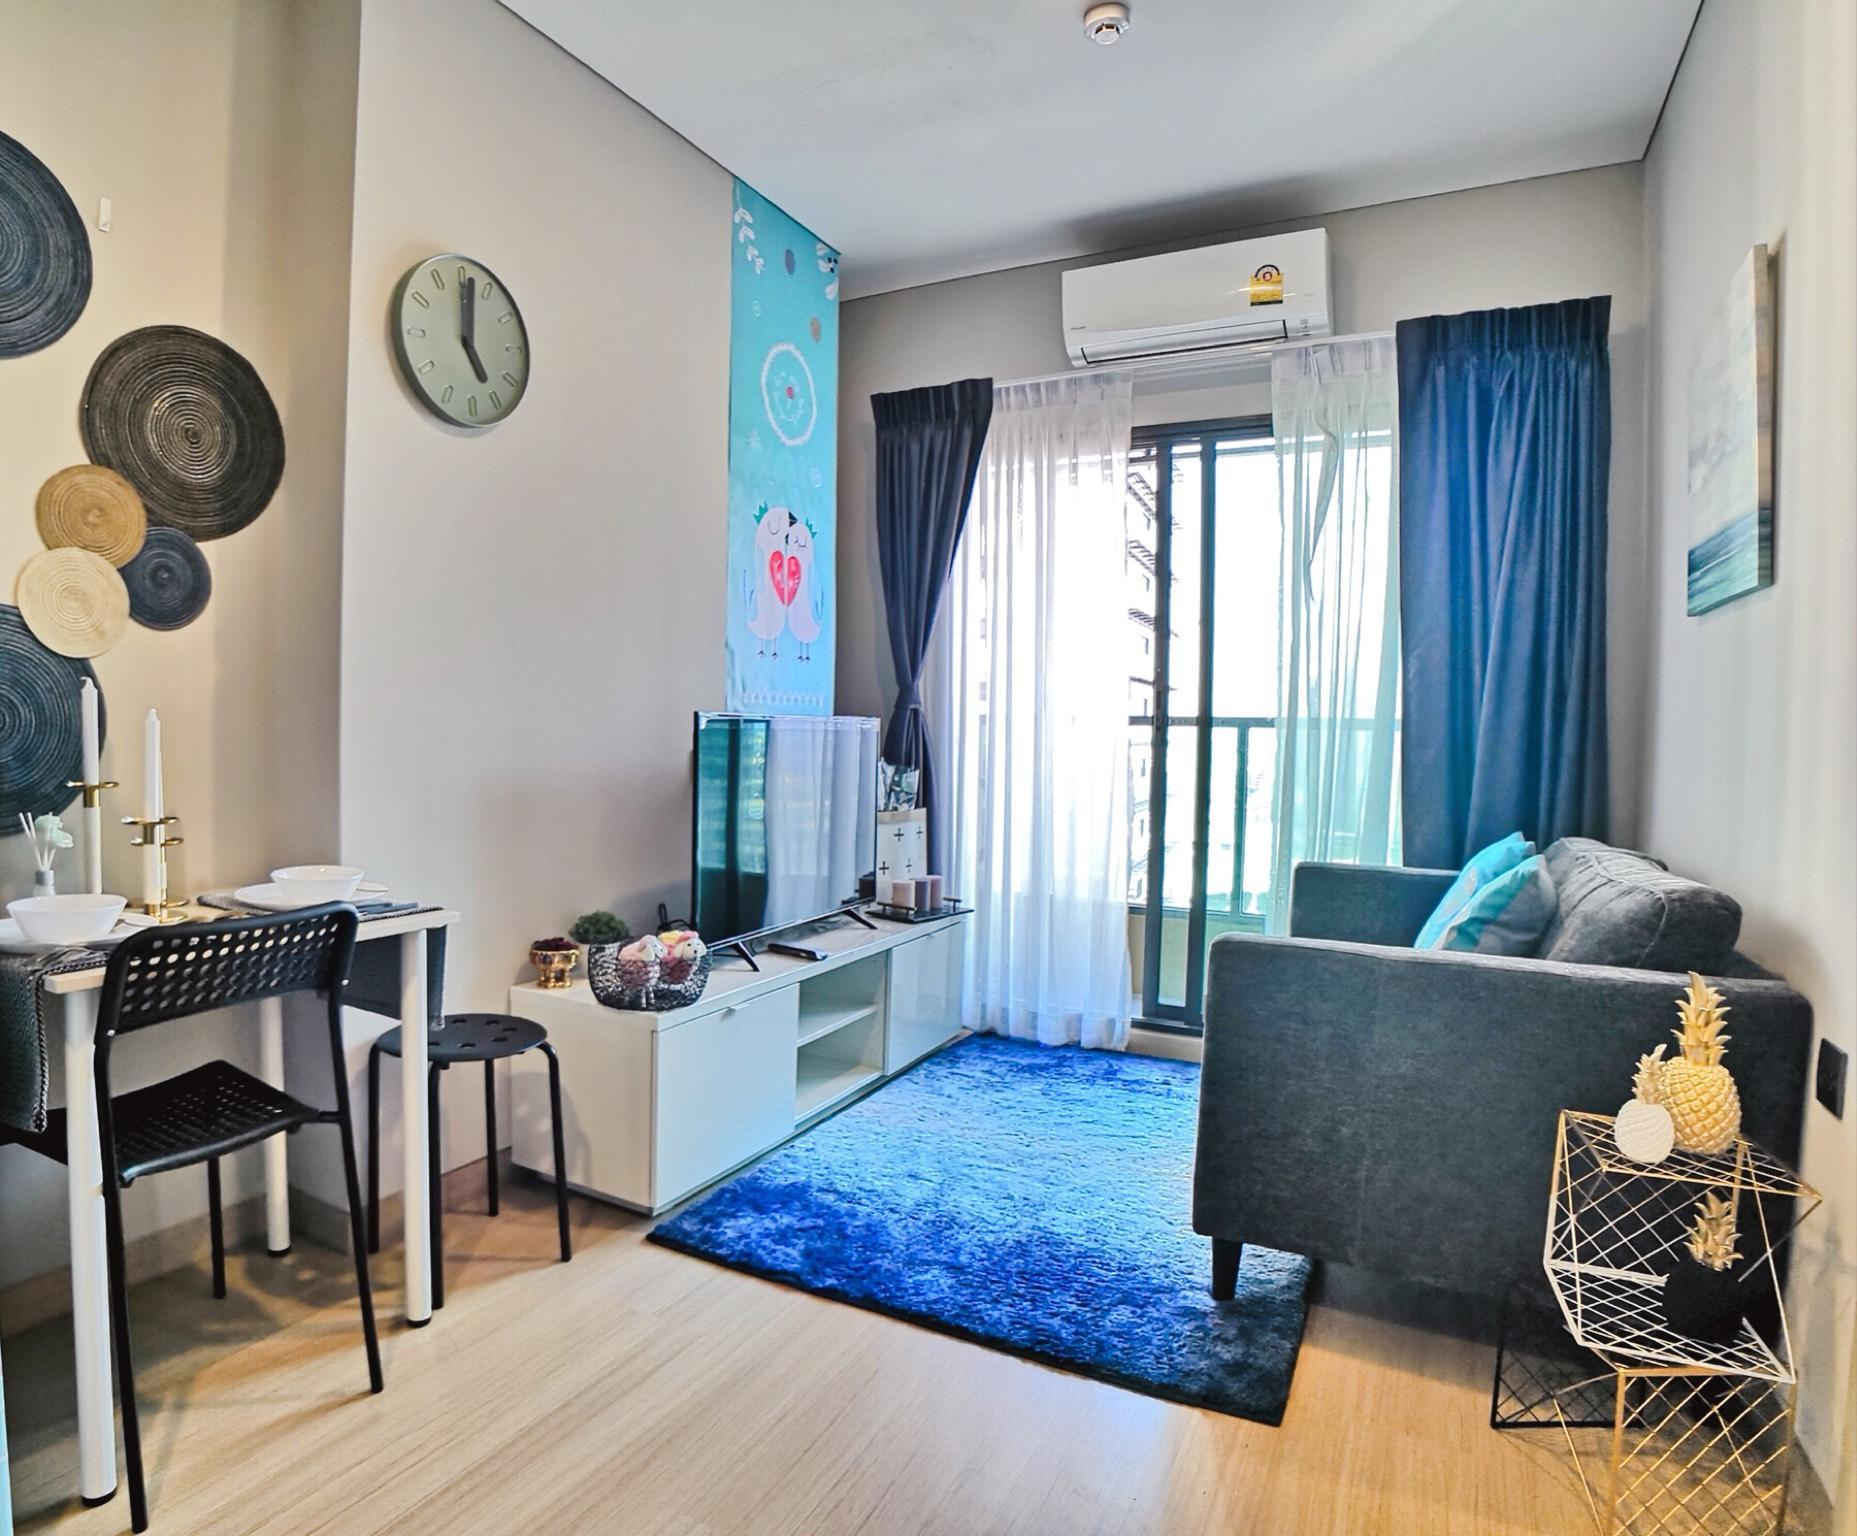 One bed Apt @MRT Phetchaburi and Airport Rail Link อพาร์ตเมนต์ 1 ห้องนอน 1 ห้องน้ำส่วนตัว ขนาด 27 ตร.ม. – รัชดาภิเษก